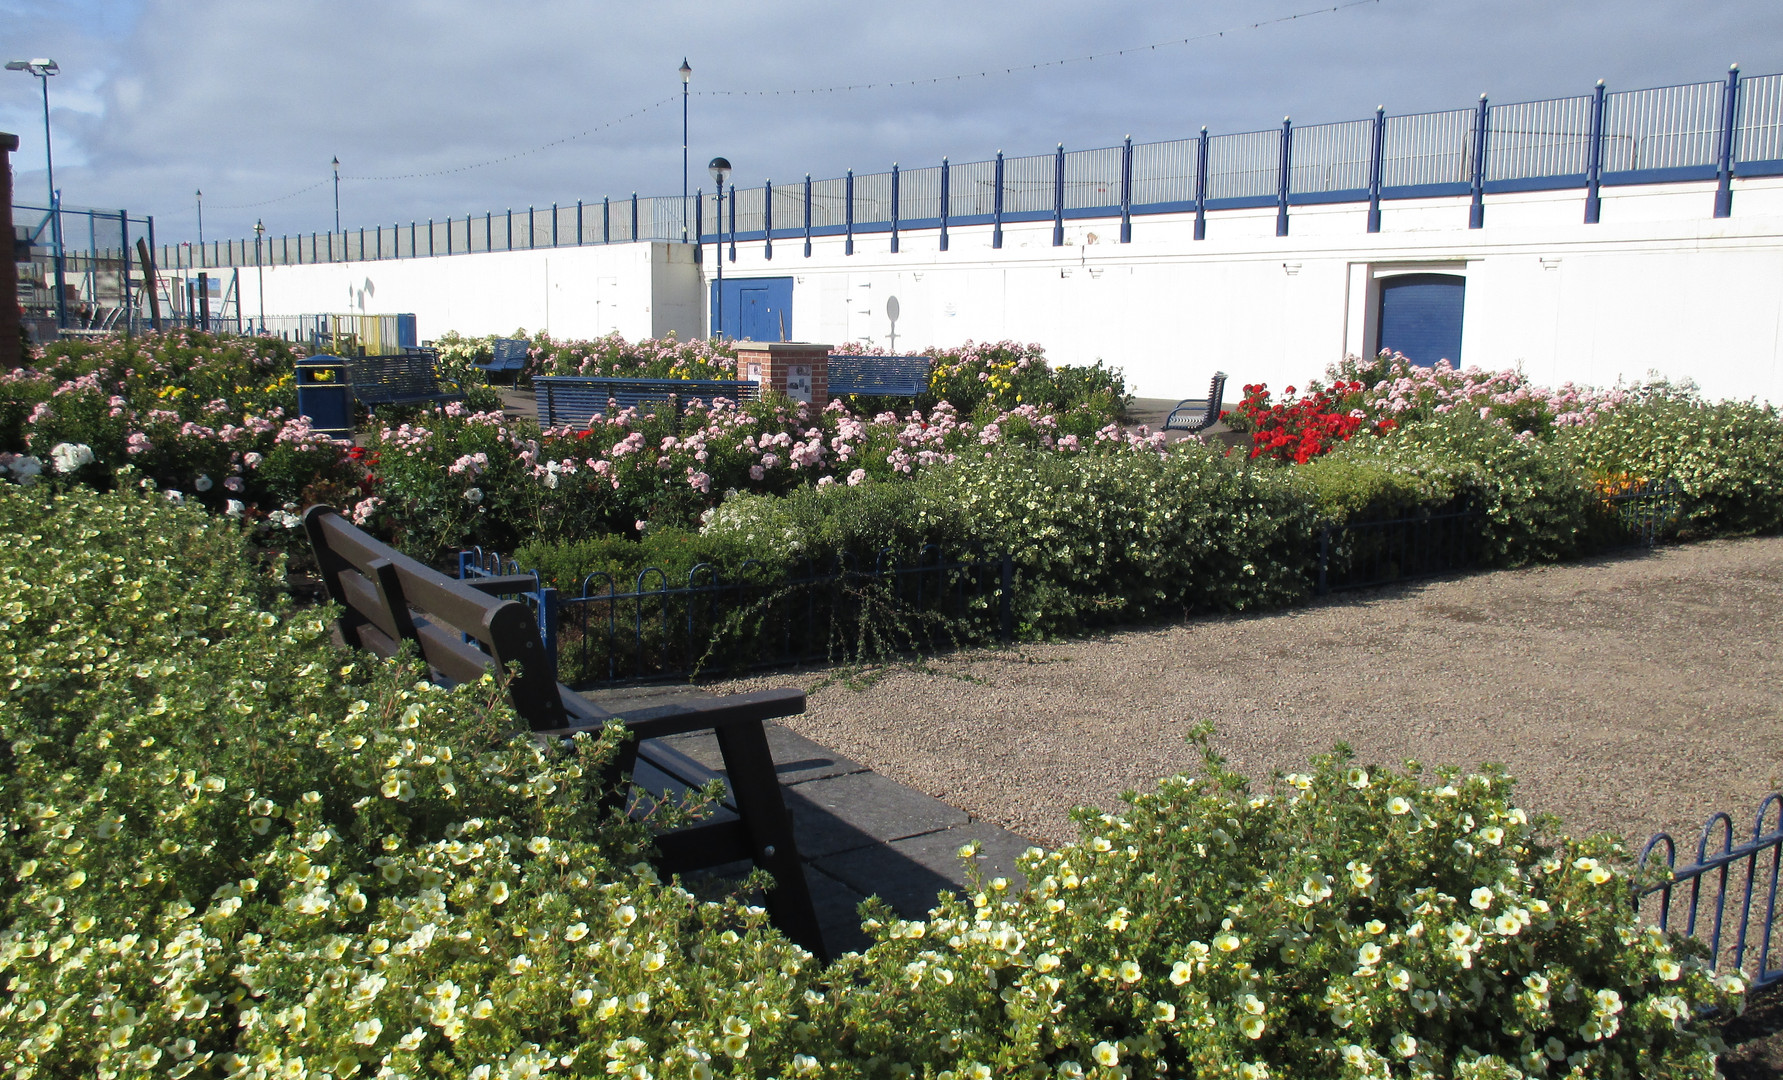 The pleasure gardens